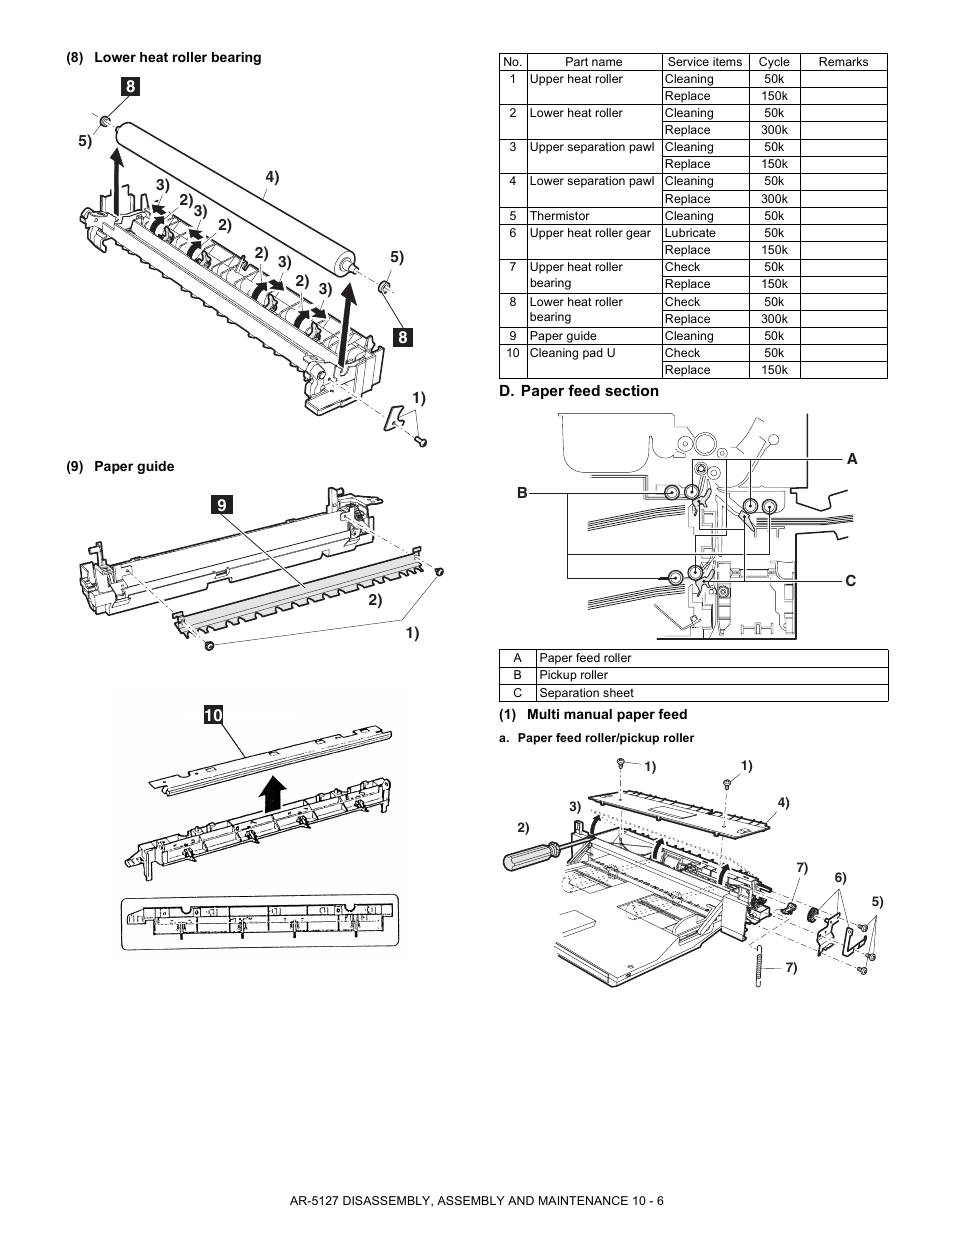 Sharp Digital Laser Copier Printer Ar 5127 User Manual Page 82 94 Diagram Of A